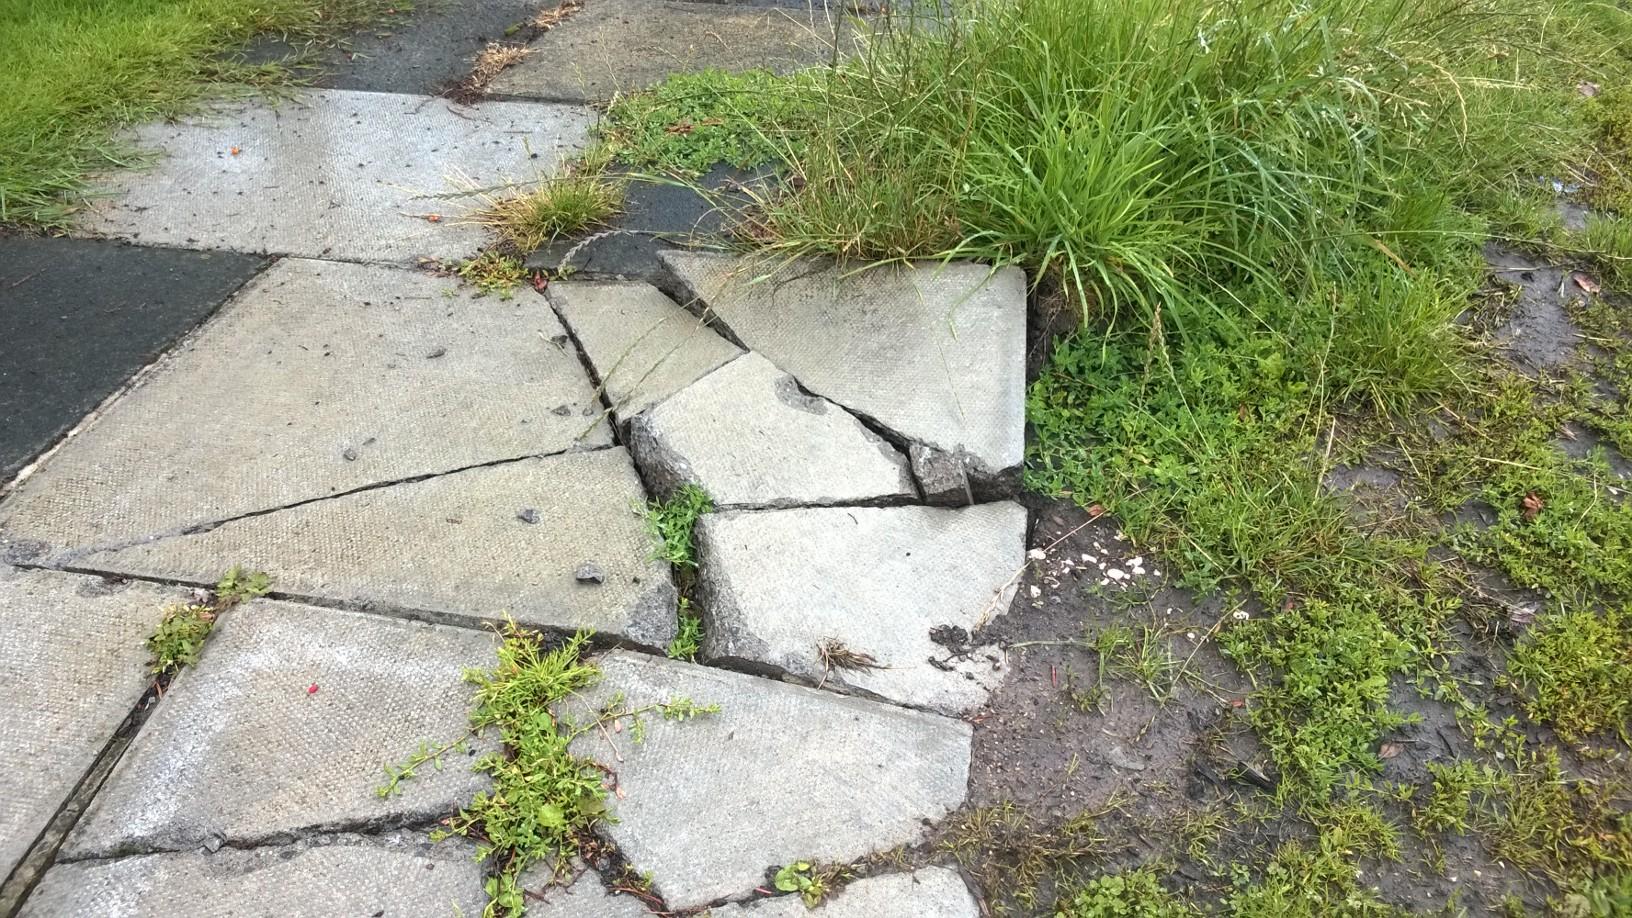 Aldersyde pavement